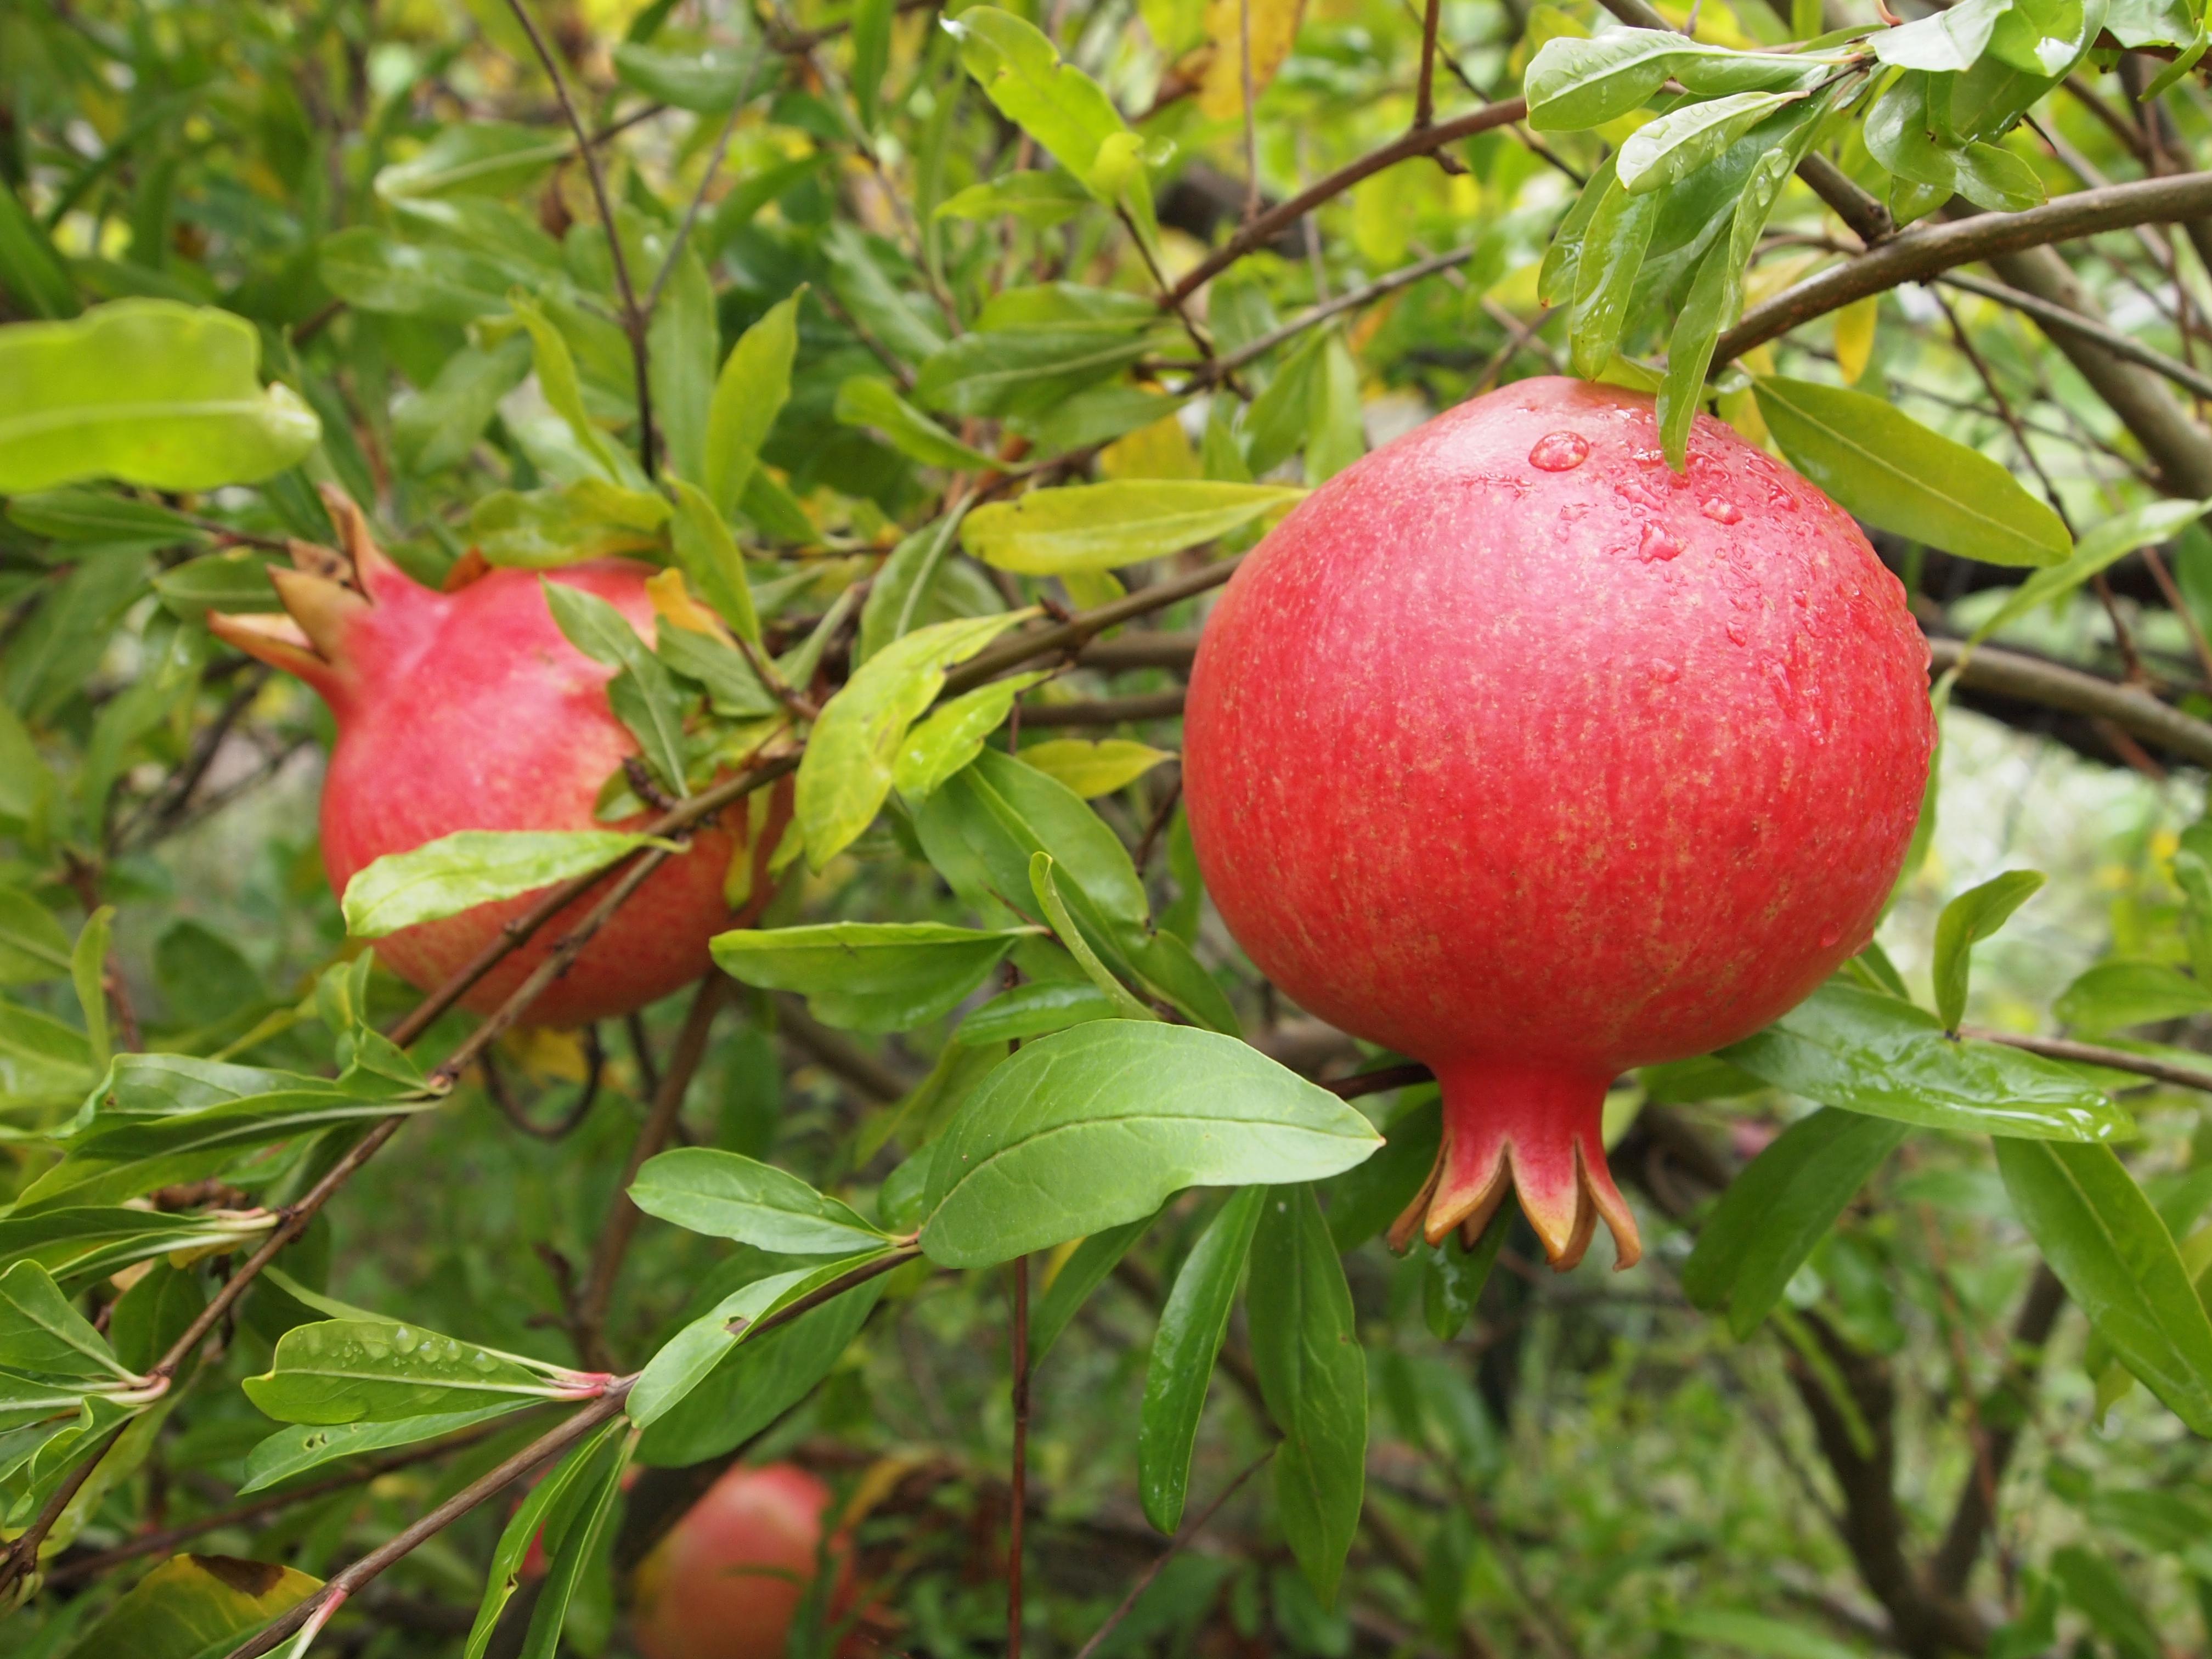 Pomegranate on shrub